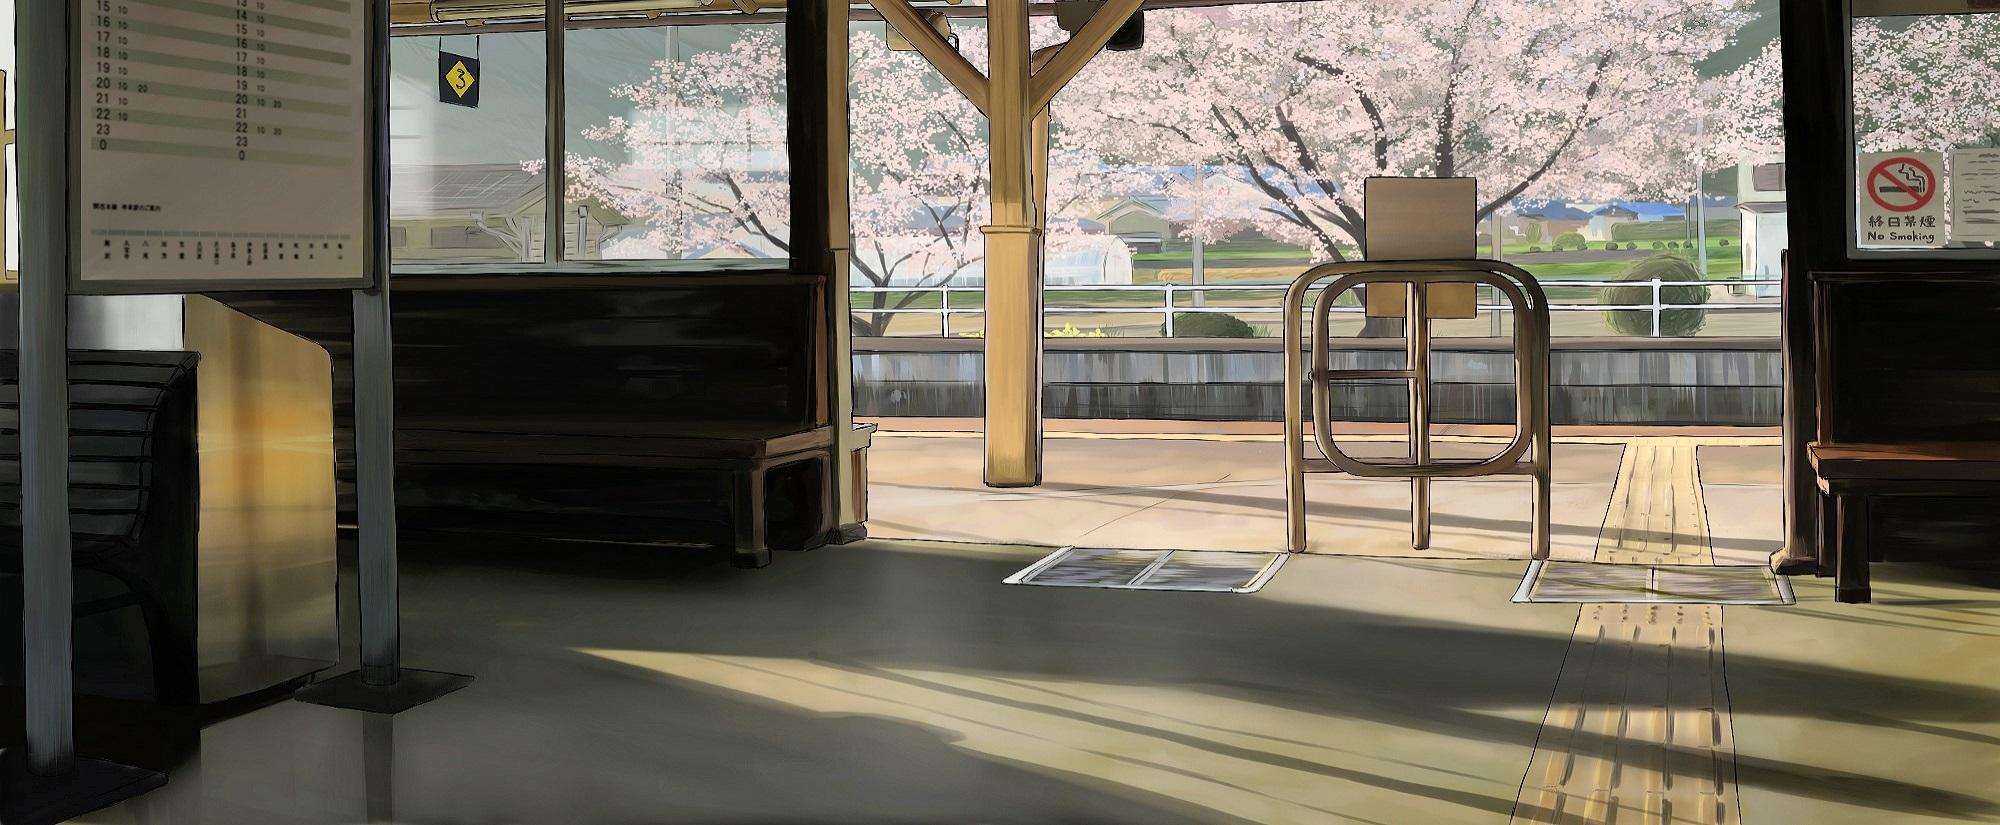 XL Background - Train Station 01.jpg